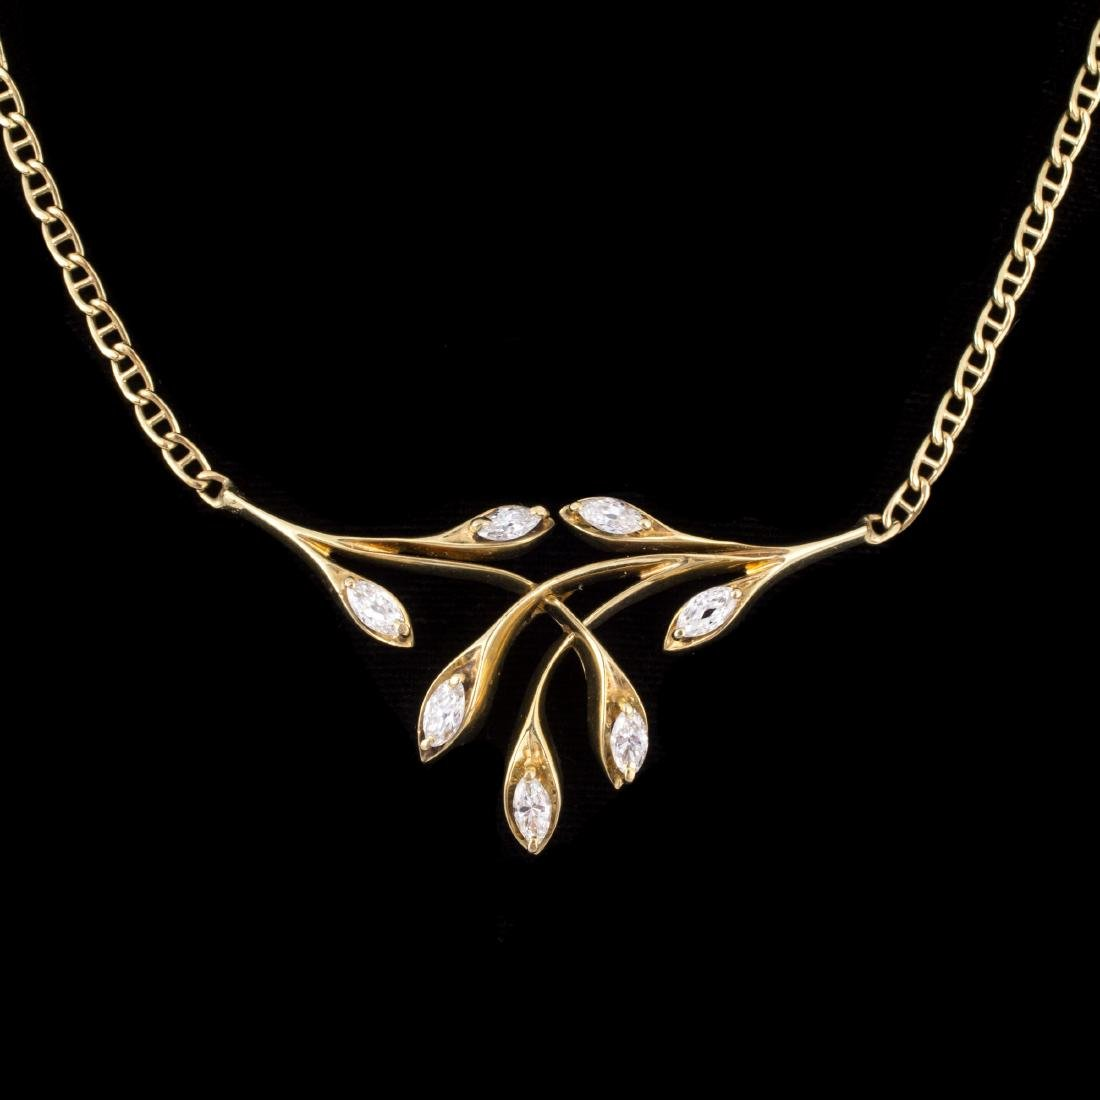 CONTEMPORARY DIAMOND & GOLD LEAF FORM NECKLACE